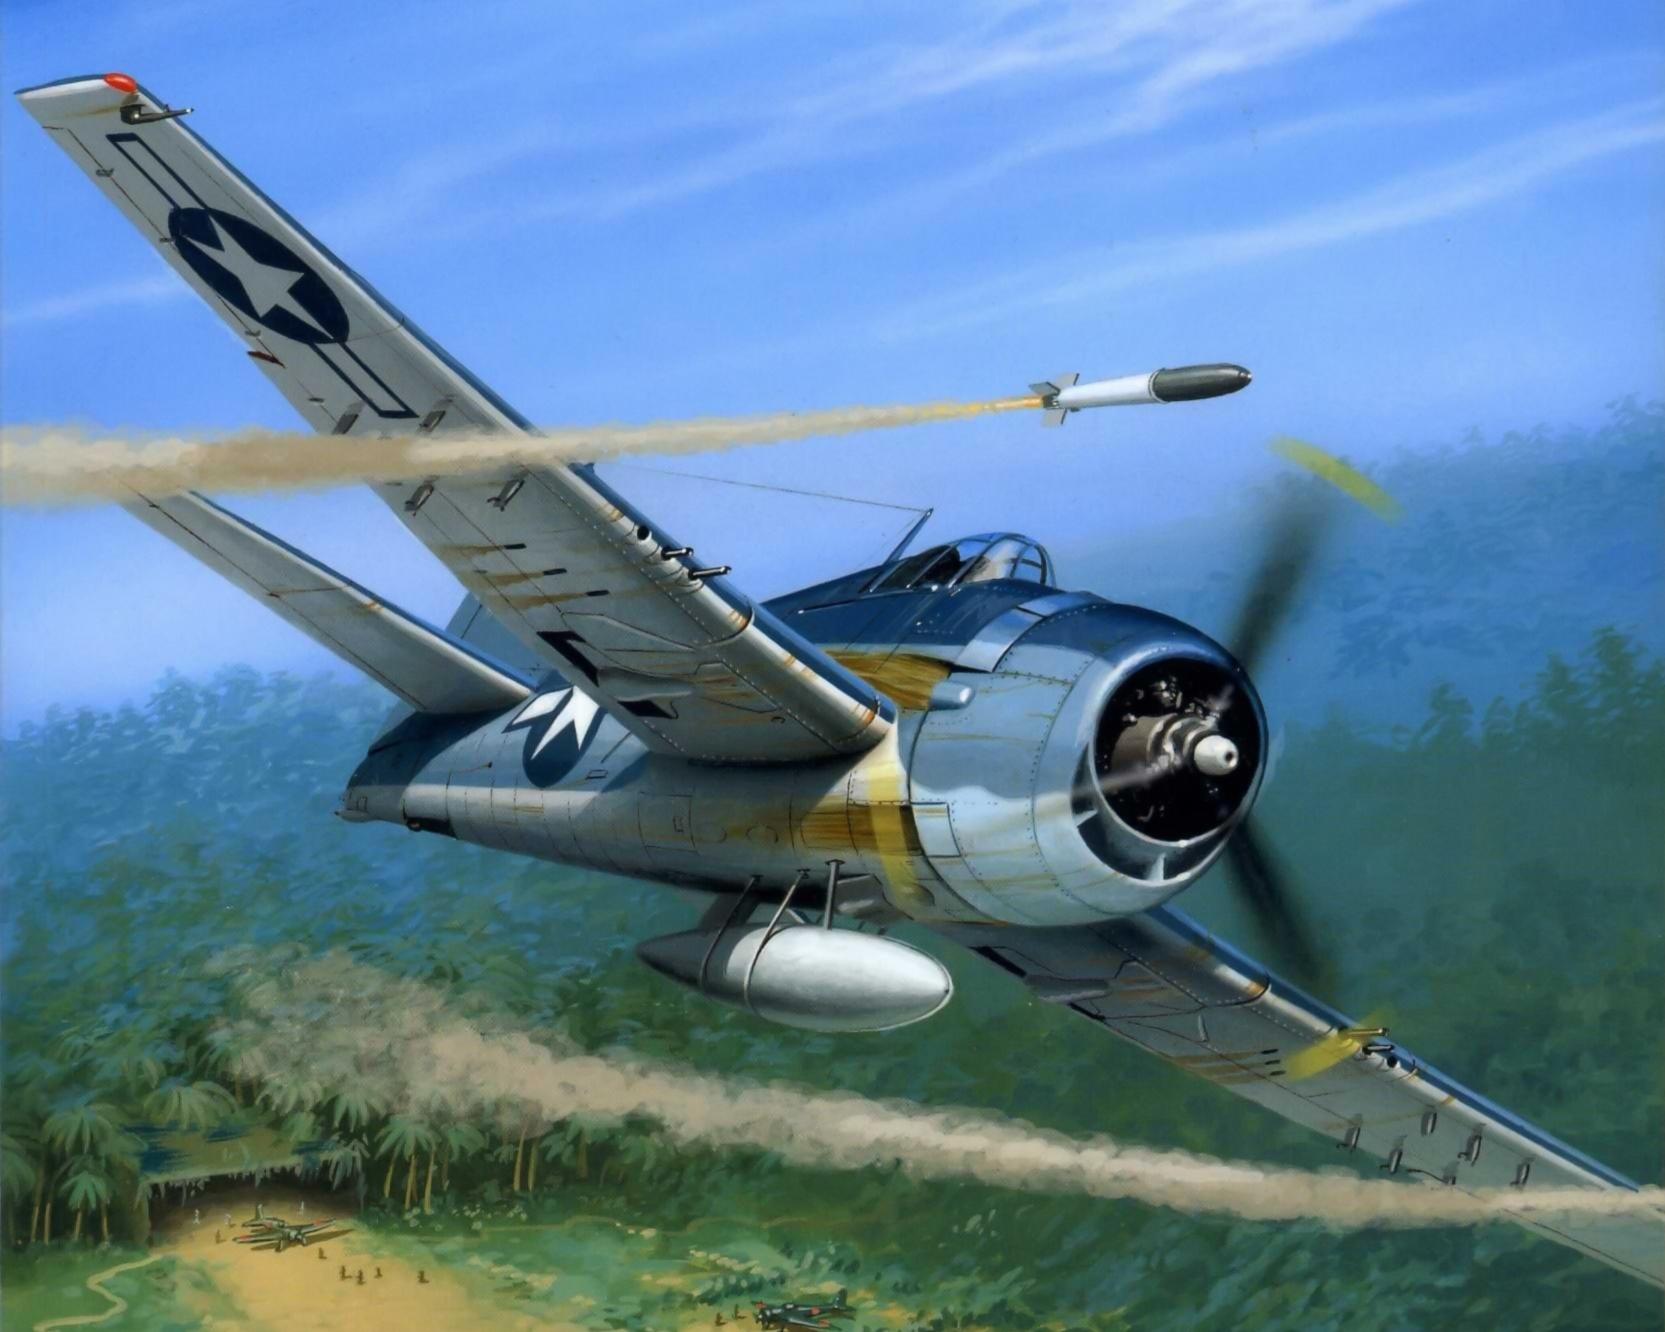 Wróbel Arkadiusz. Истребитель Grumman F-6F Hellcat.